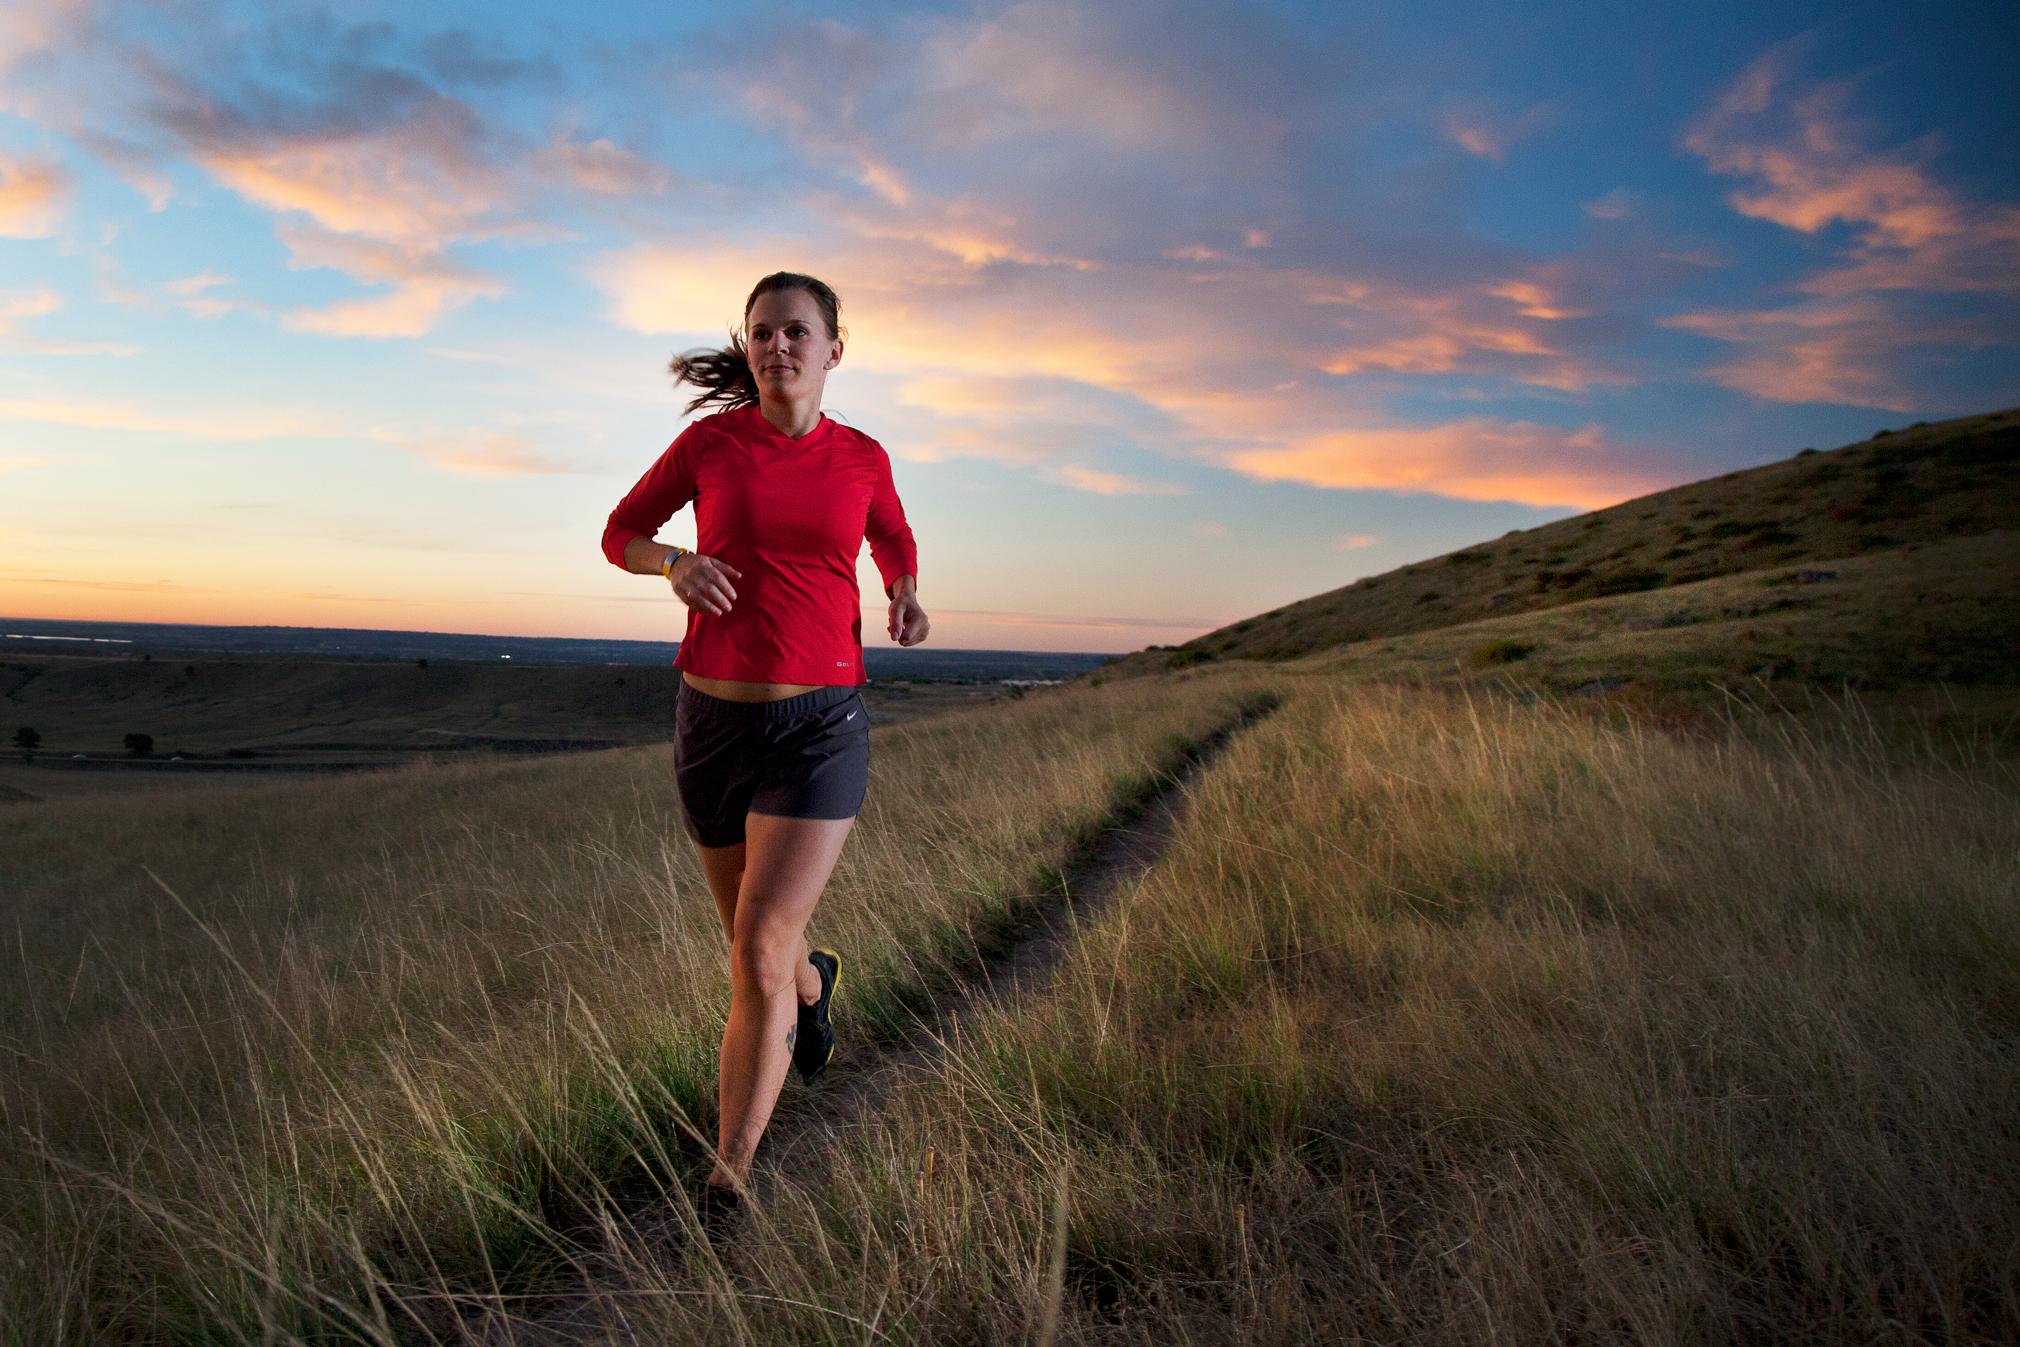 Healthline: Should You Run with Plantar Fasciitis?